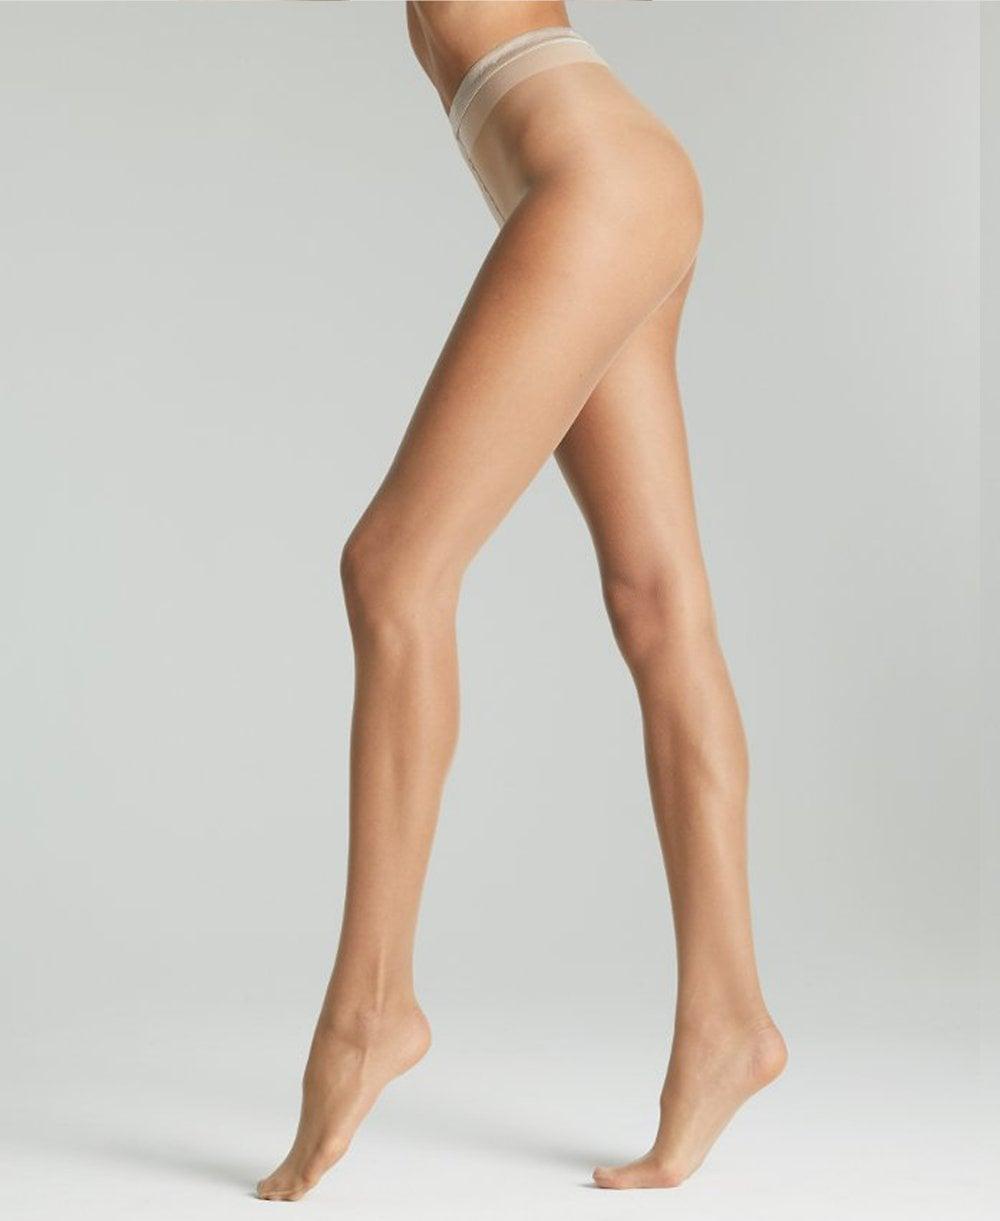 4aecc3552d023 Fogal Catwalk 10 Denier Tights - Tights from luxury-legs.com UK